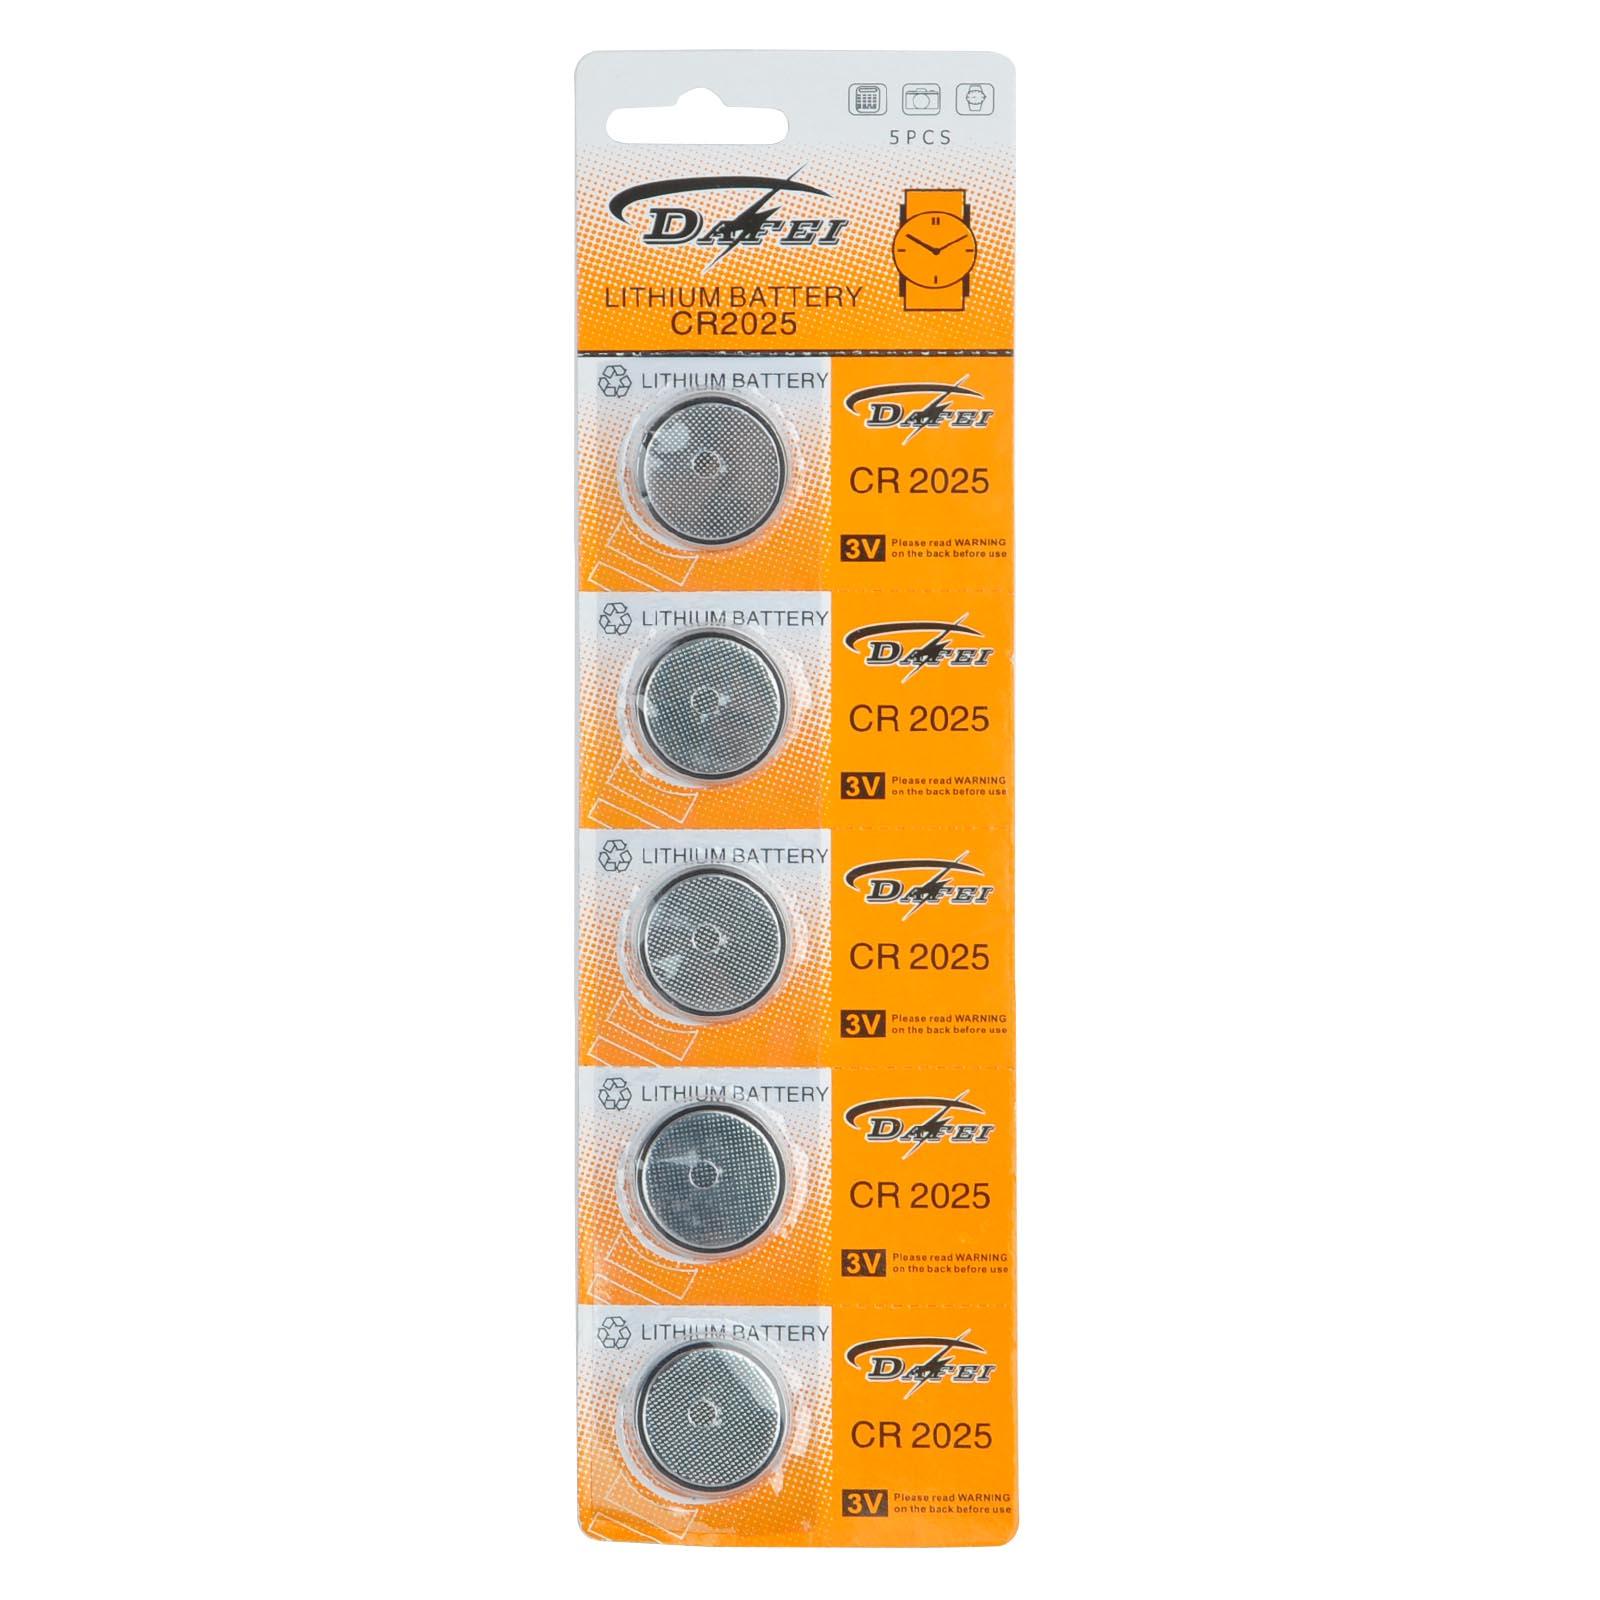 5x CR2025 3V литиевая батарея таблеточного типа монета Батарея часы замена менять батарейки часы детский электронная игрушка CR2025 батареи Аксесс...